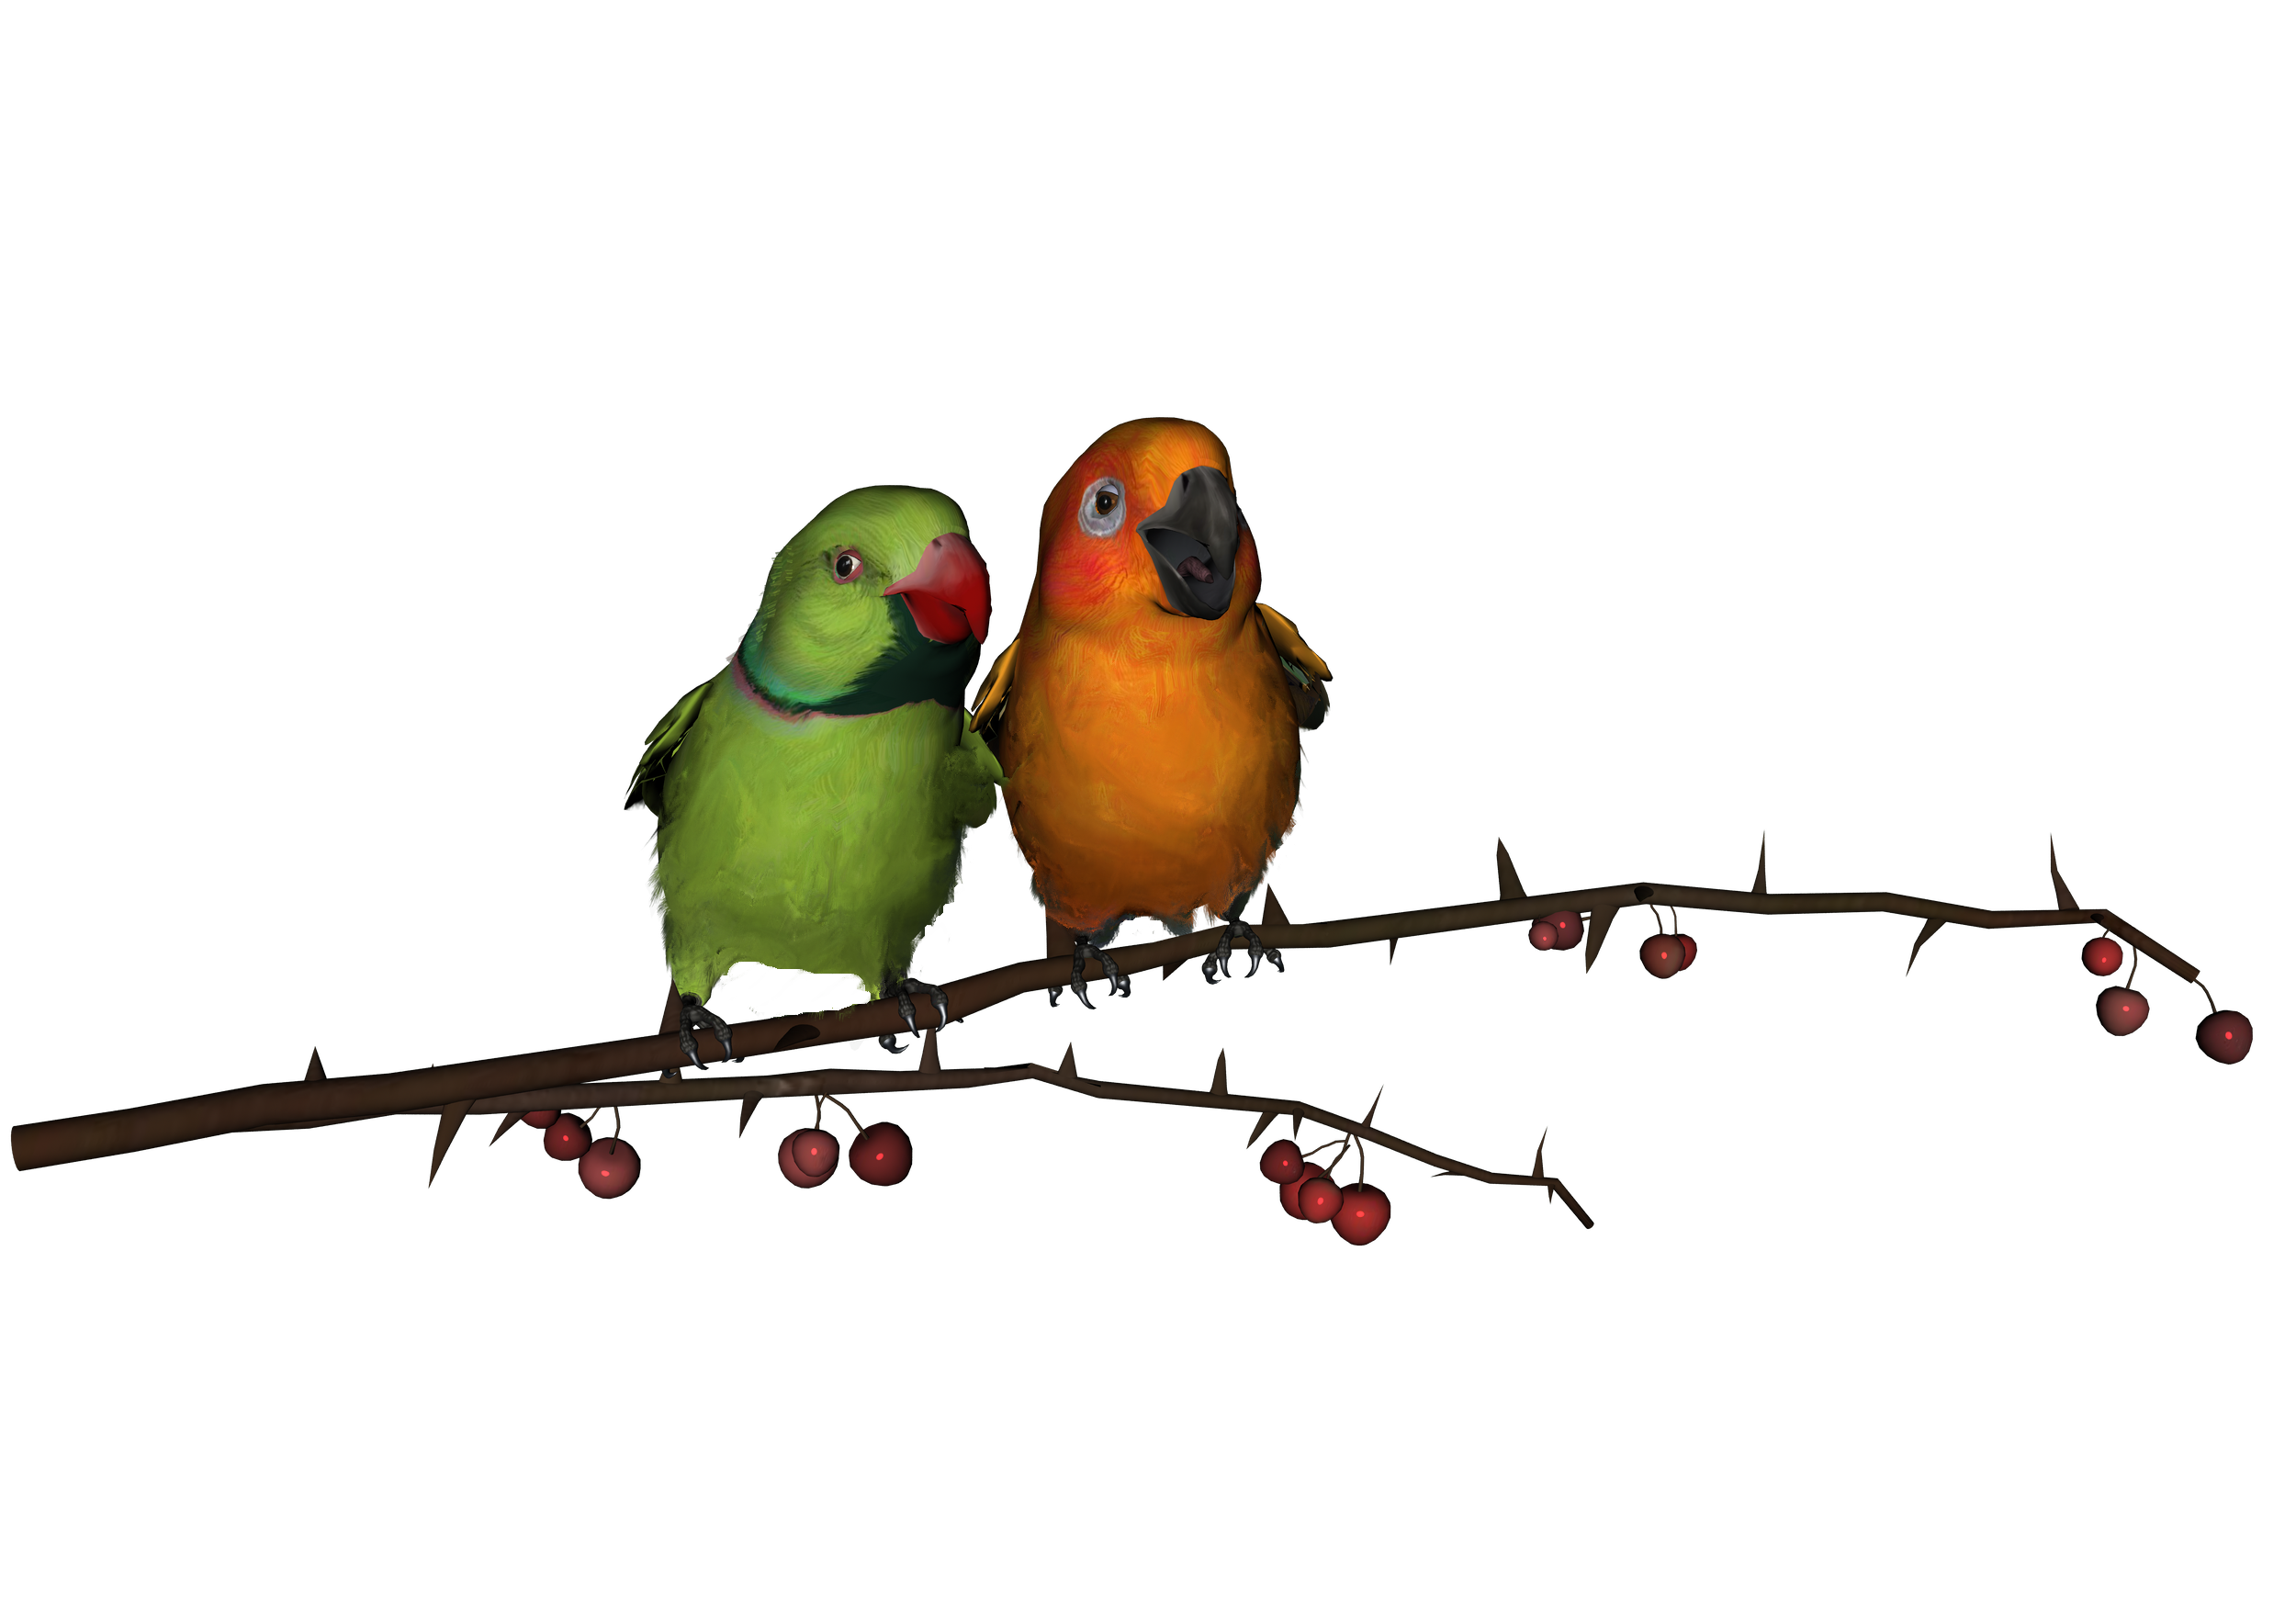 Love bird tree clipart jpg royalty free stock Lovebird PNG HD Transparent Lovebird HD.PNG Images. | PlusPNG jpg royalty free stock